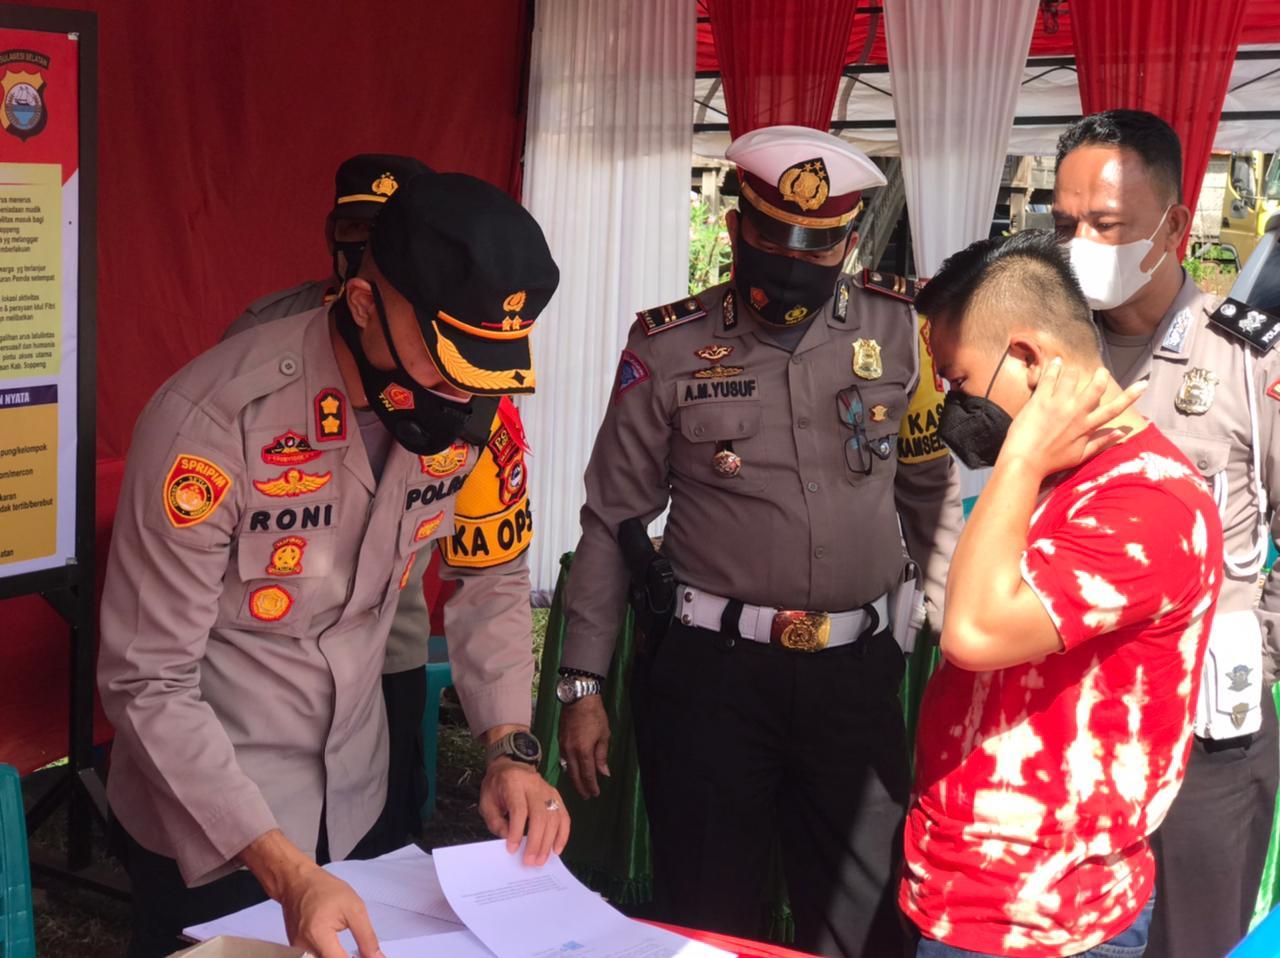 Kapolres Soppeng Kunjungi Posko Penyekatan Lebaran Ketupat di Kecamatan Marioriawa